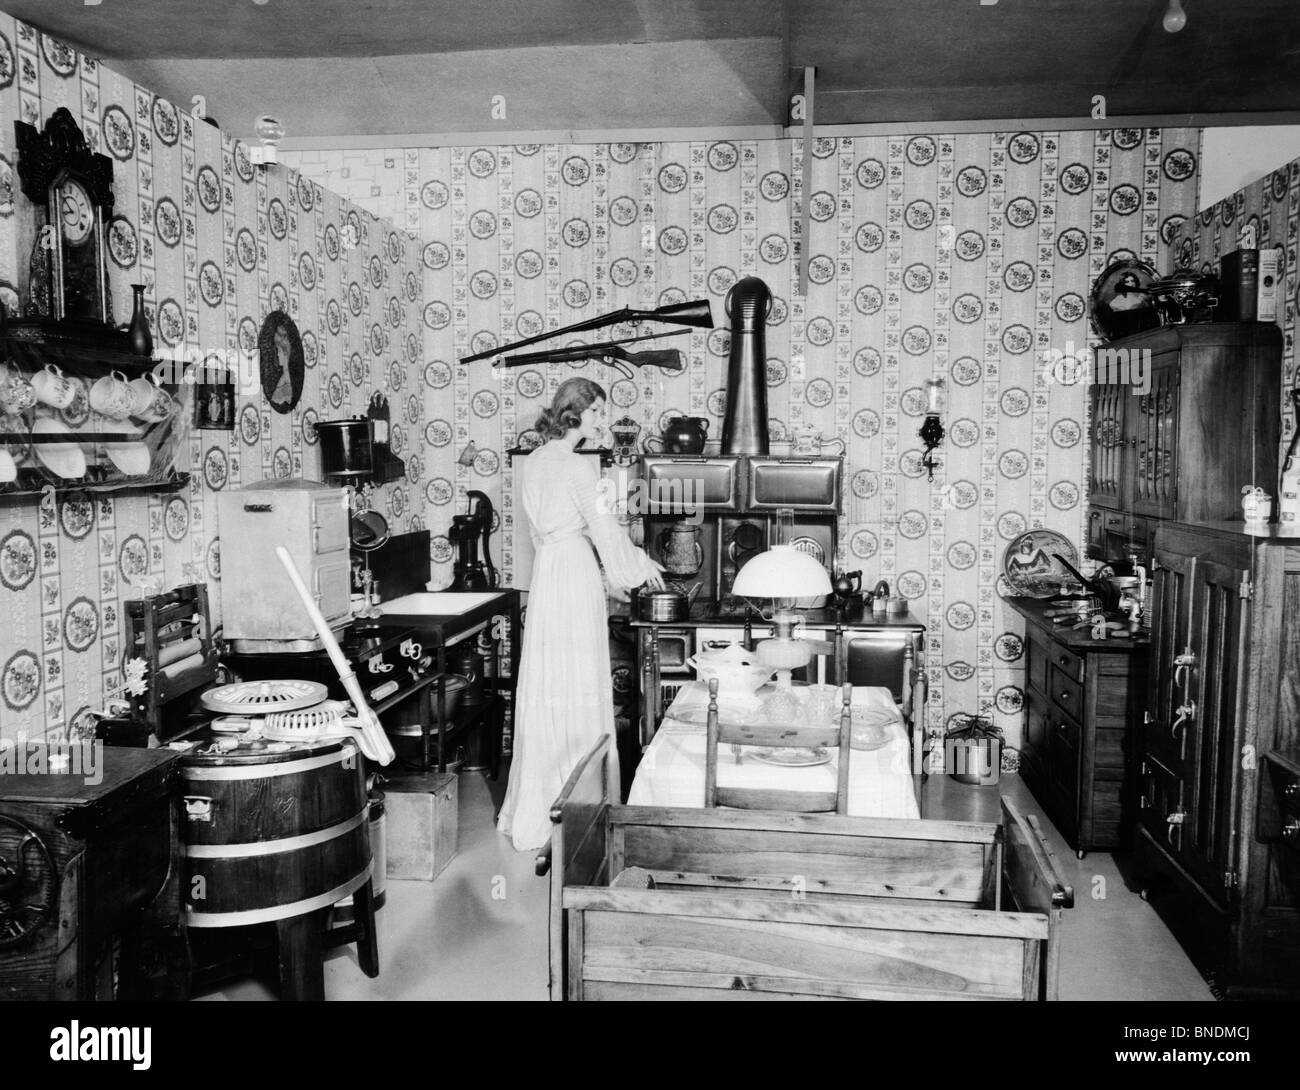 Pioneer Stove Stockfotos & Pioneer Stove Bilder - Alamy